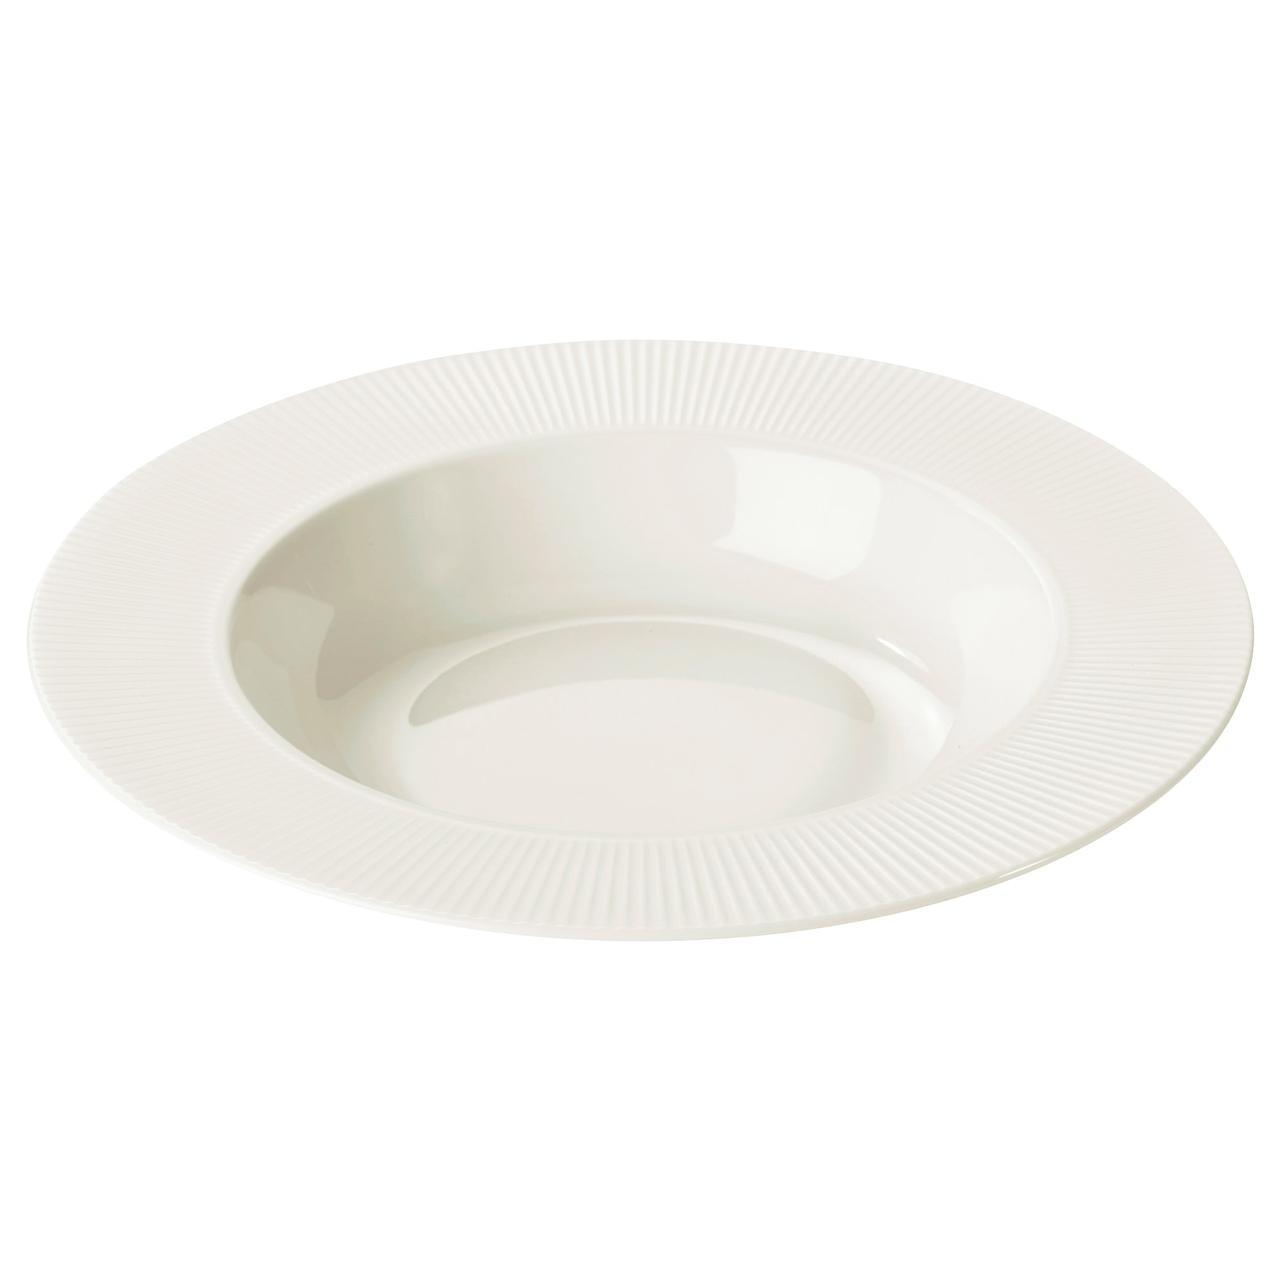 ✅ IKEA OFANTLIGT (603.190.19) Глубокая белая тарелка